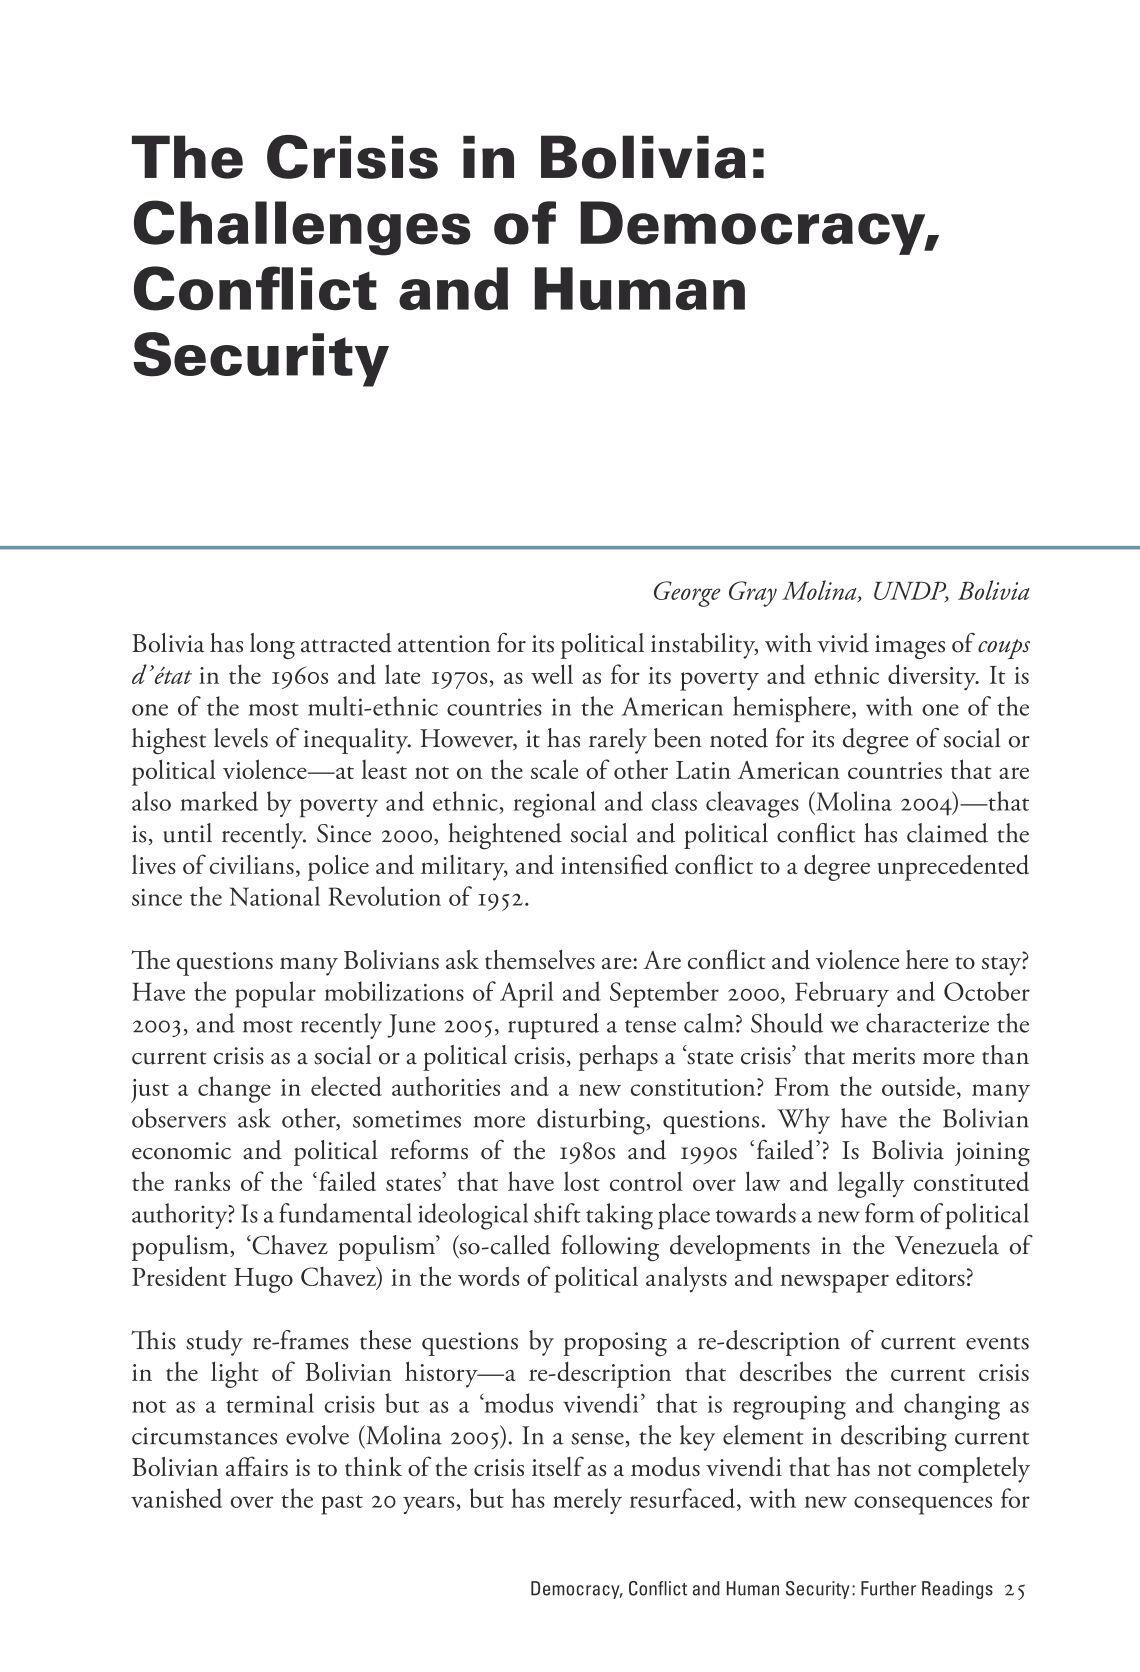 Politics of Bolivia